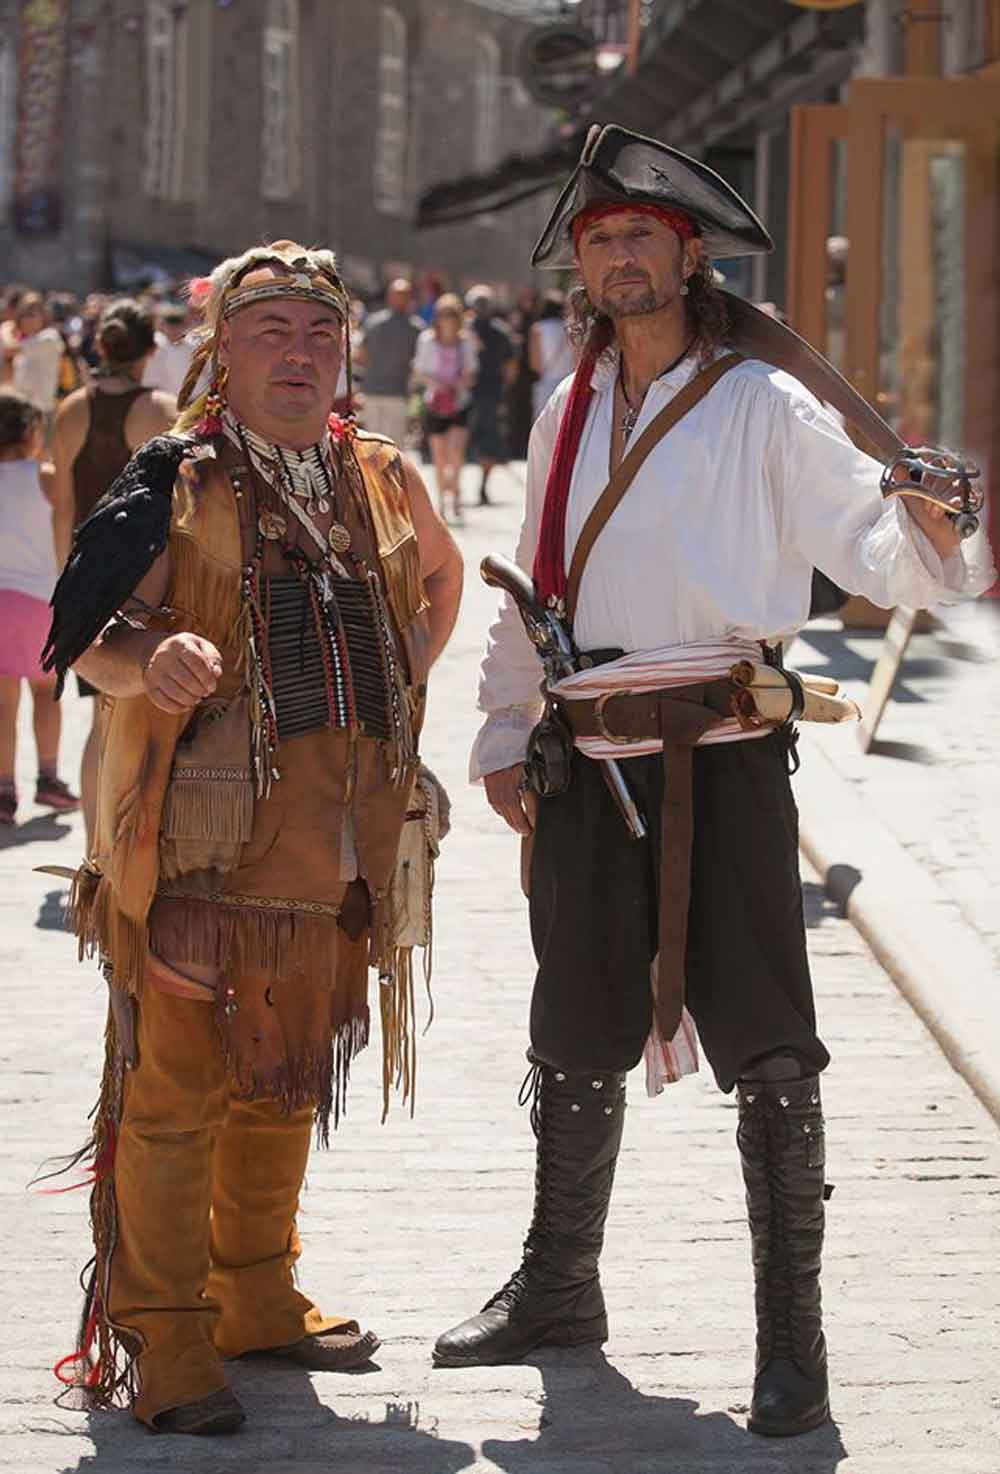 Photos de pirate avec Capitaine Loran et un Amérindien Wanda